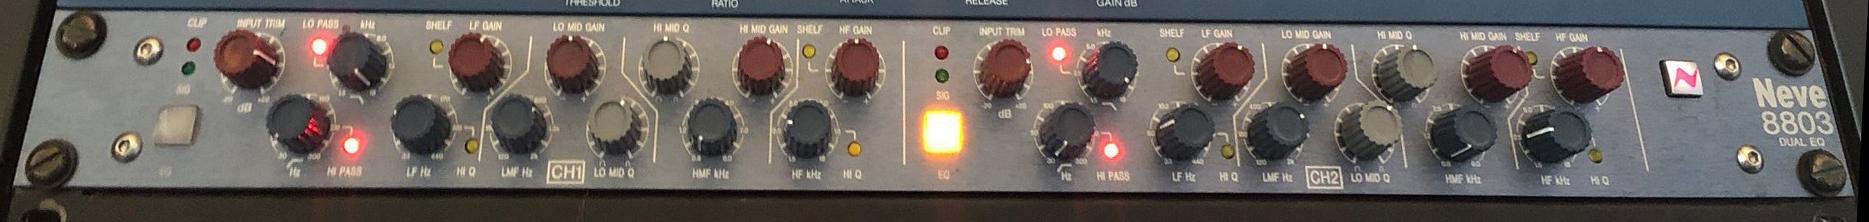 Neve 8803 EQ: Here´s the legendary NEVE sound. Foto: Privat